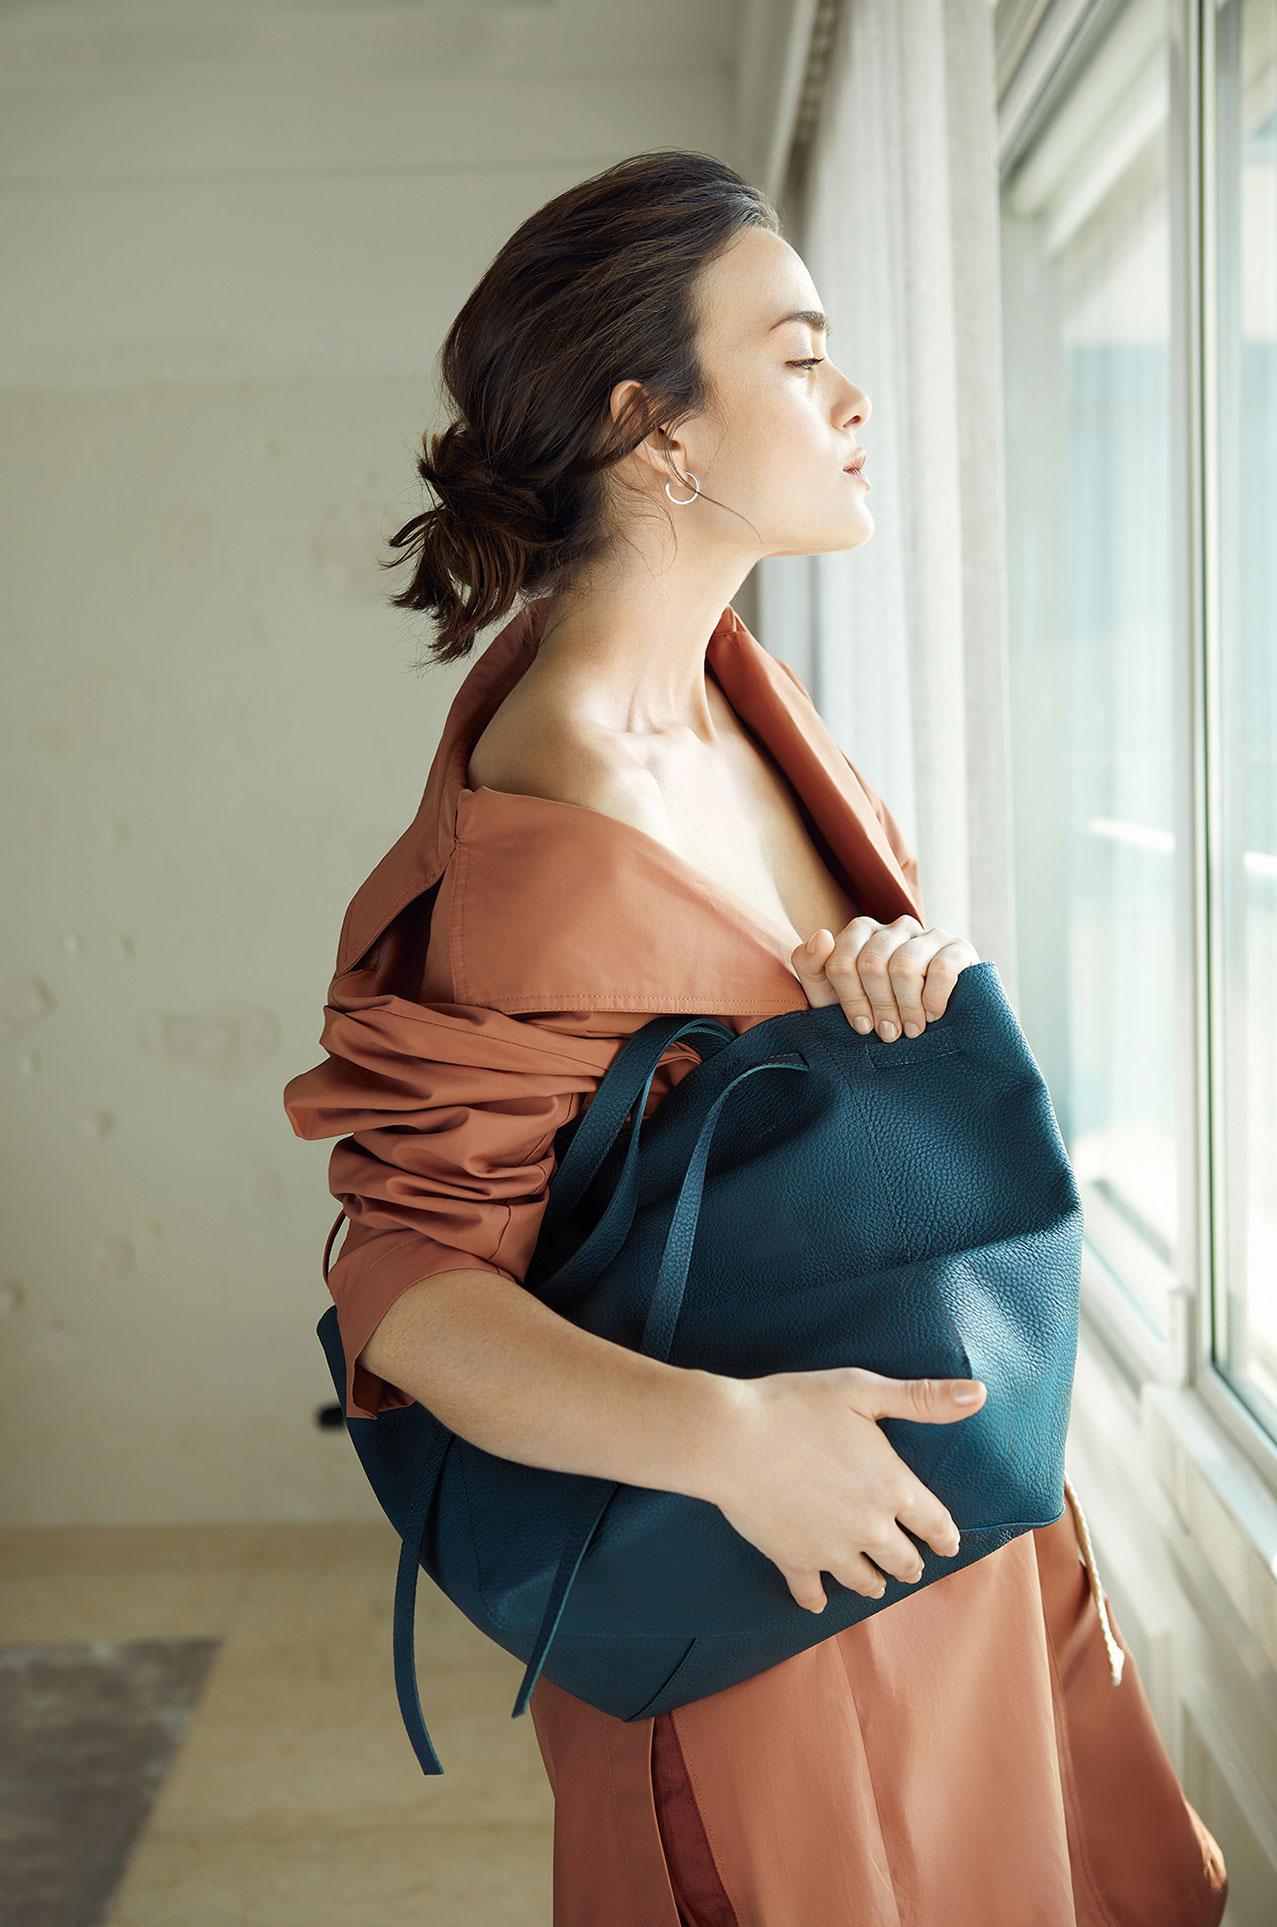 Модная одежда Ginger Buenos Aires, весна-лето 2019 / Florencia Alzieu by Cecilia Romano